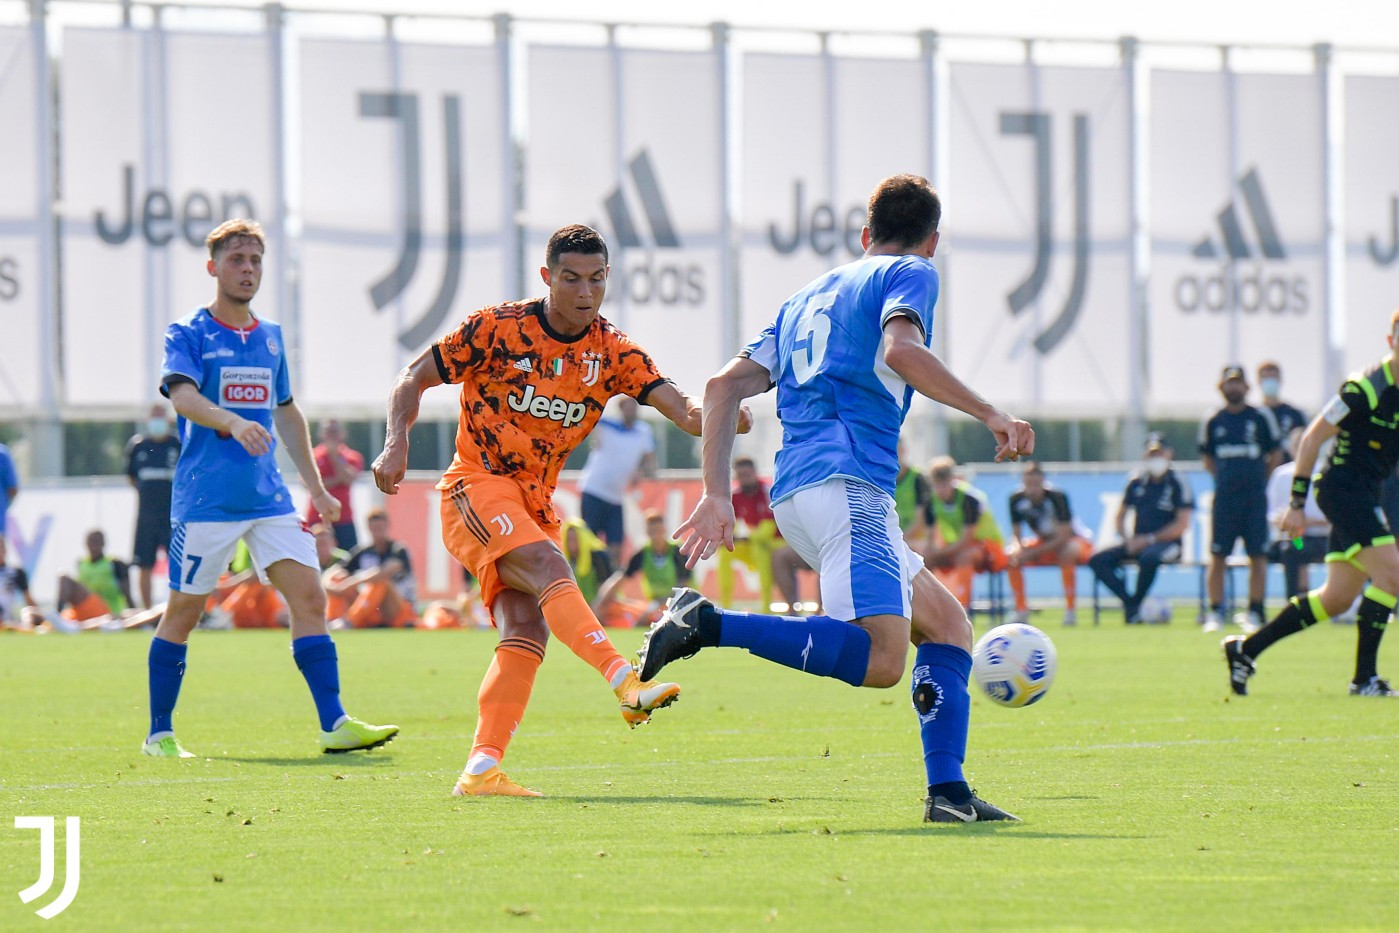 Juve-Novara 5-0, buona la prima per Pirlo |  Sport e Vai